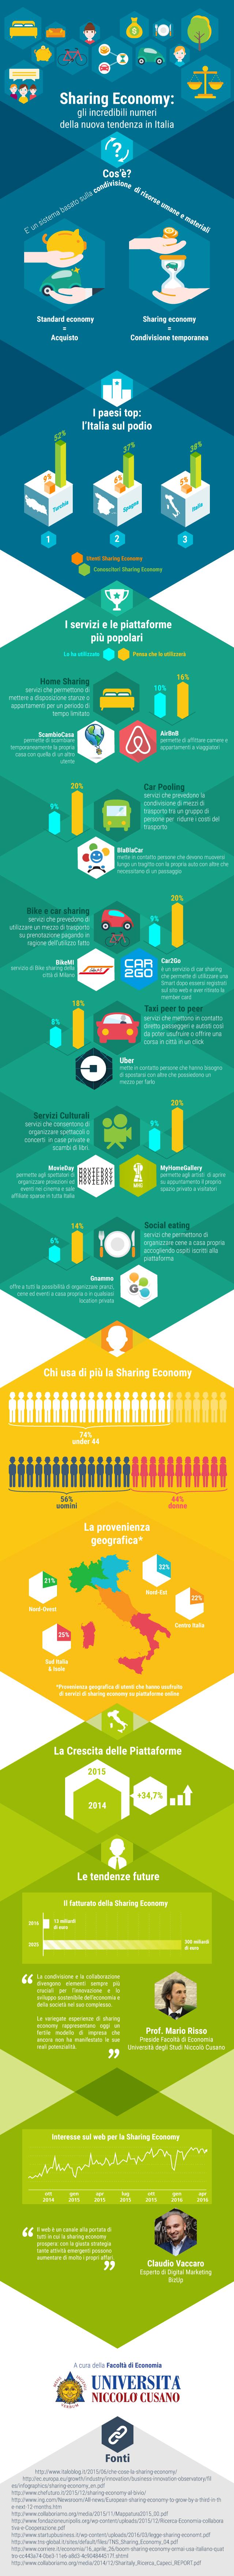 Unicusano_infografica_sharing_economy